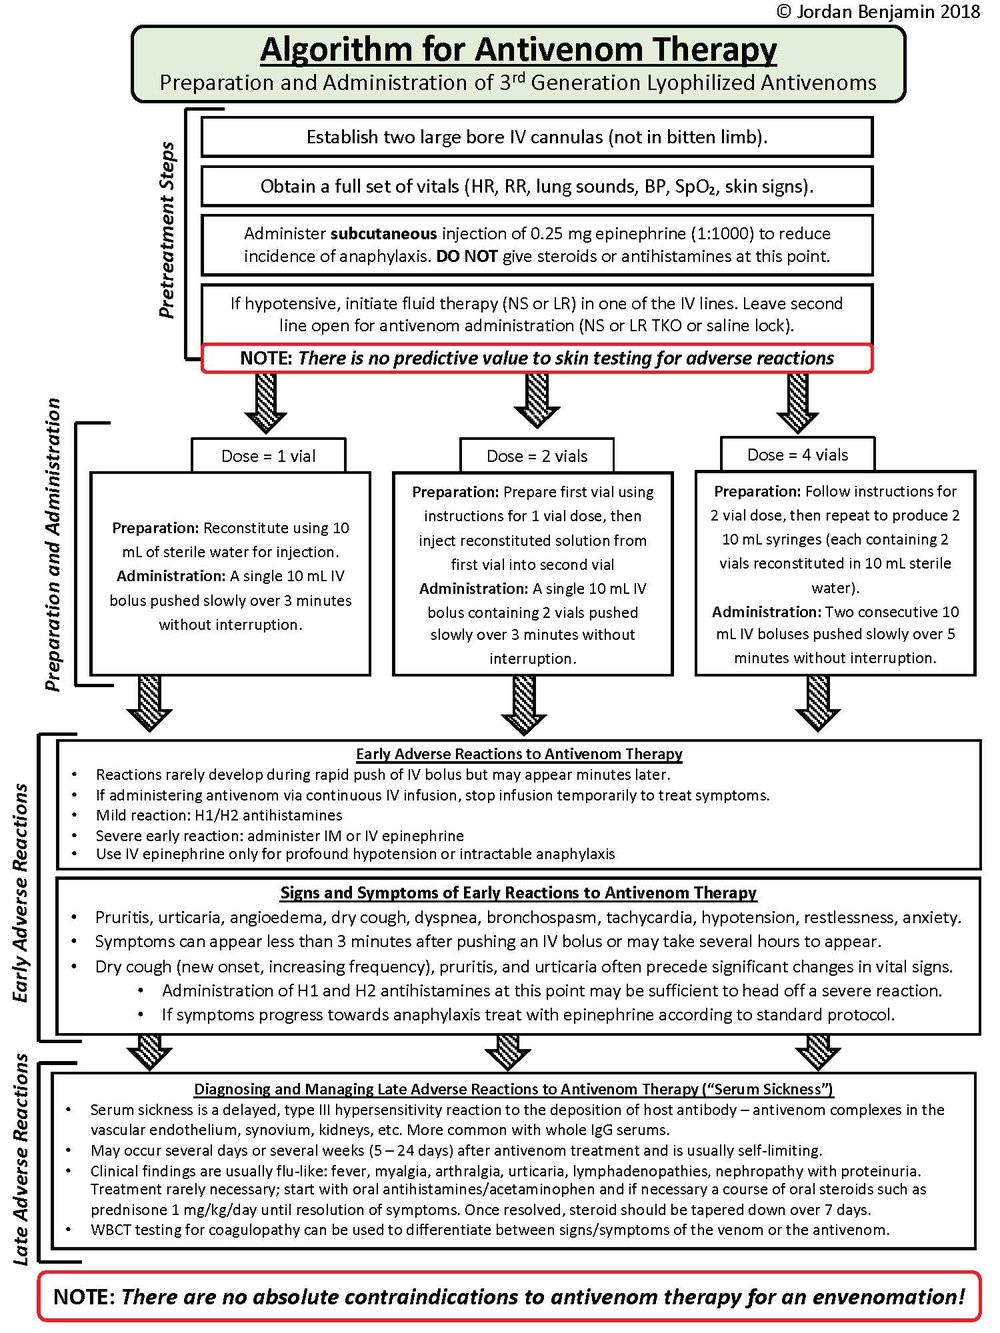 Algorithm for Antivenom Therapy.jpg